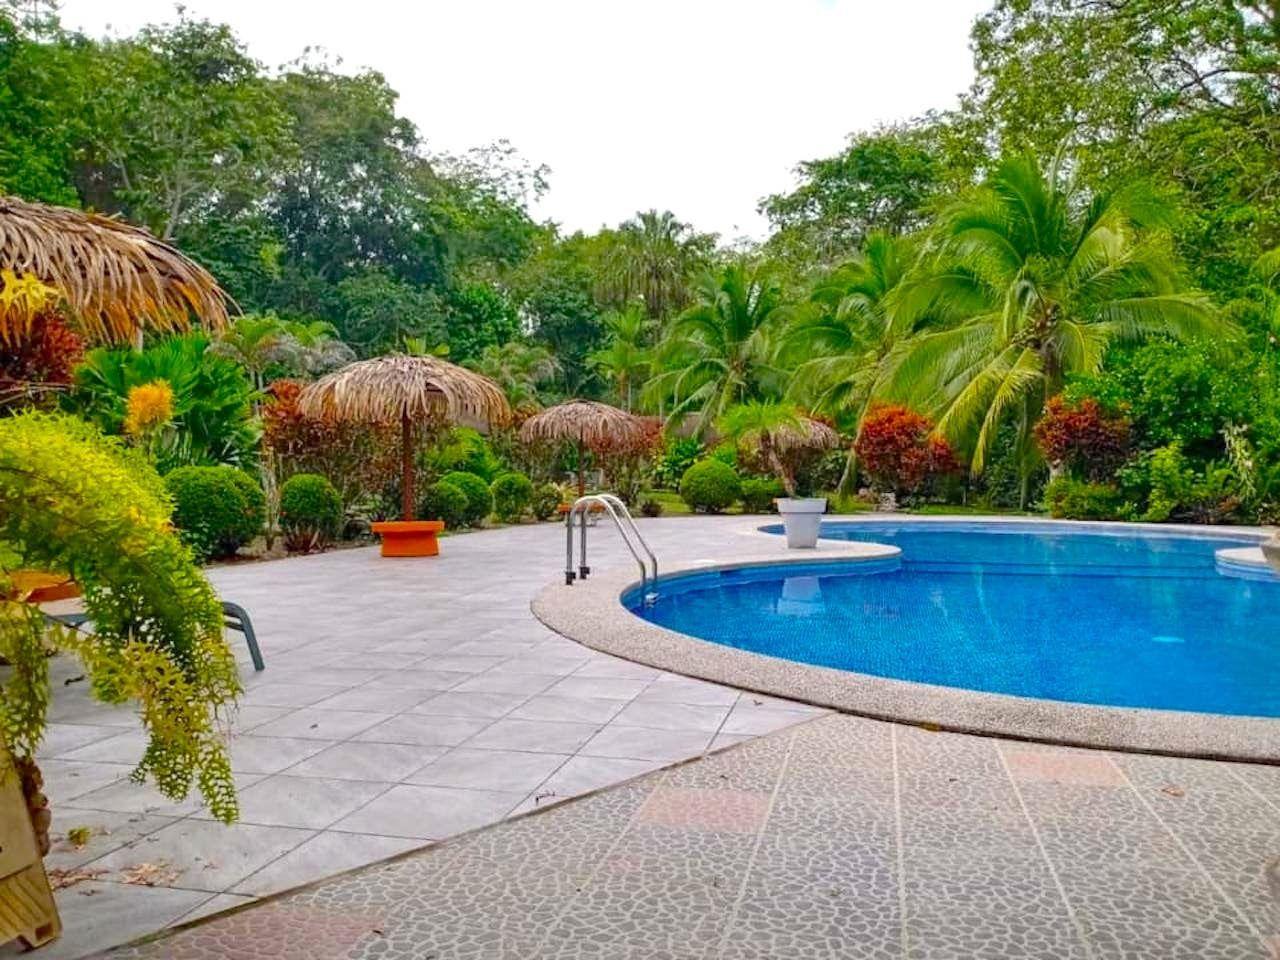 cahuita costa rica, where to stay suizo loco lodge